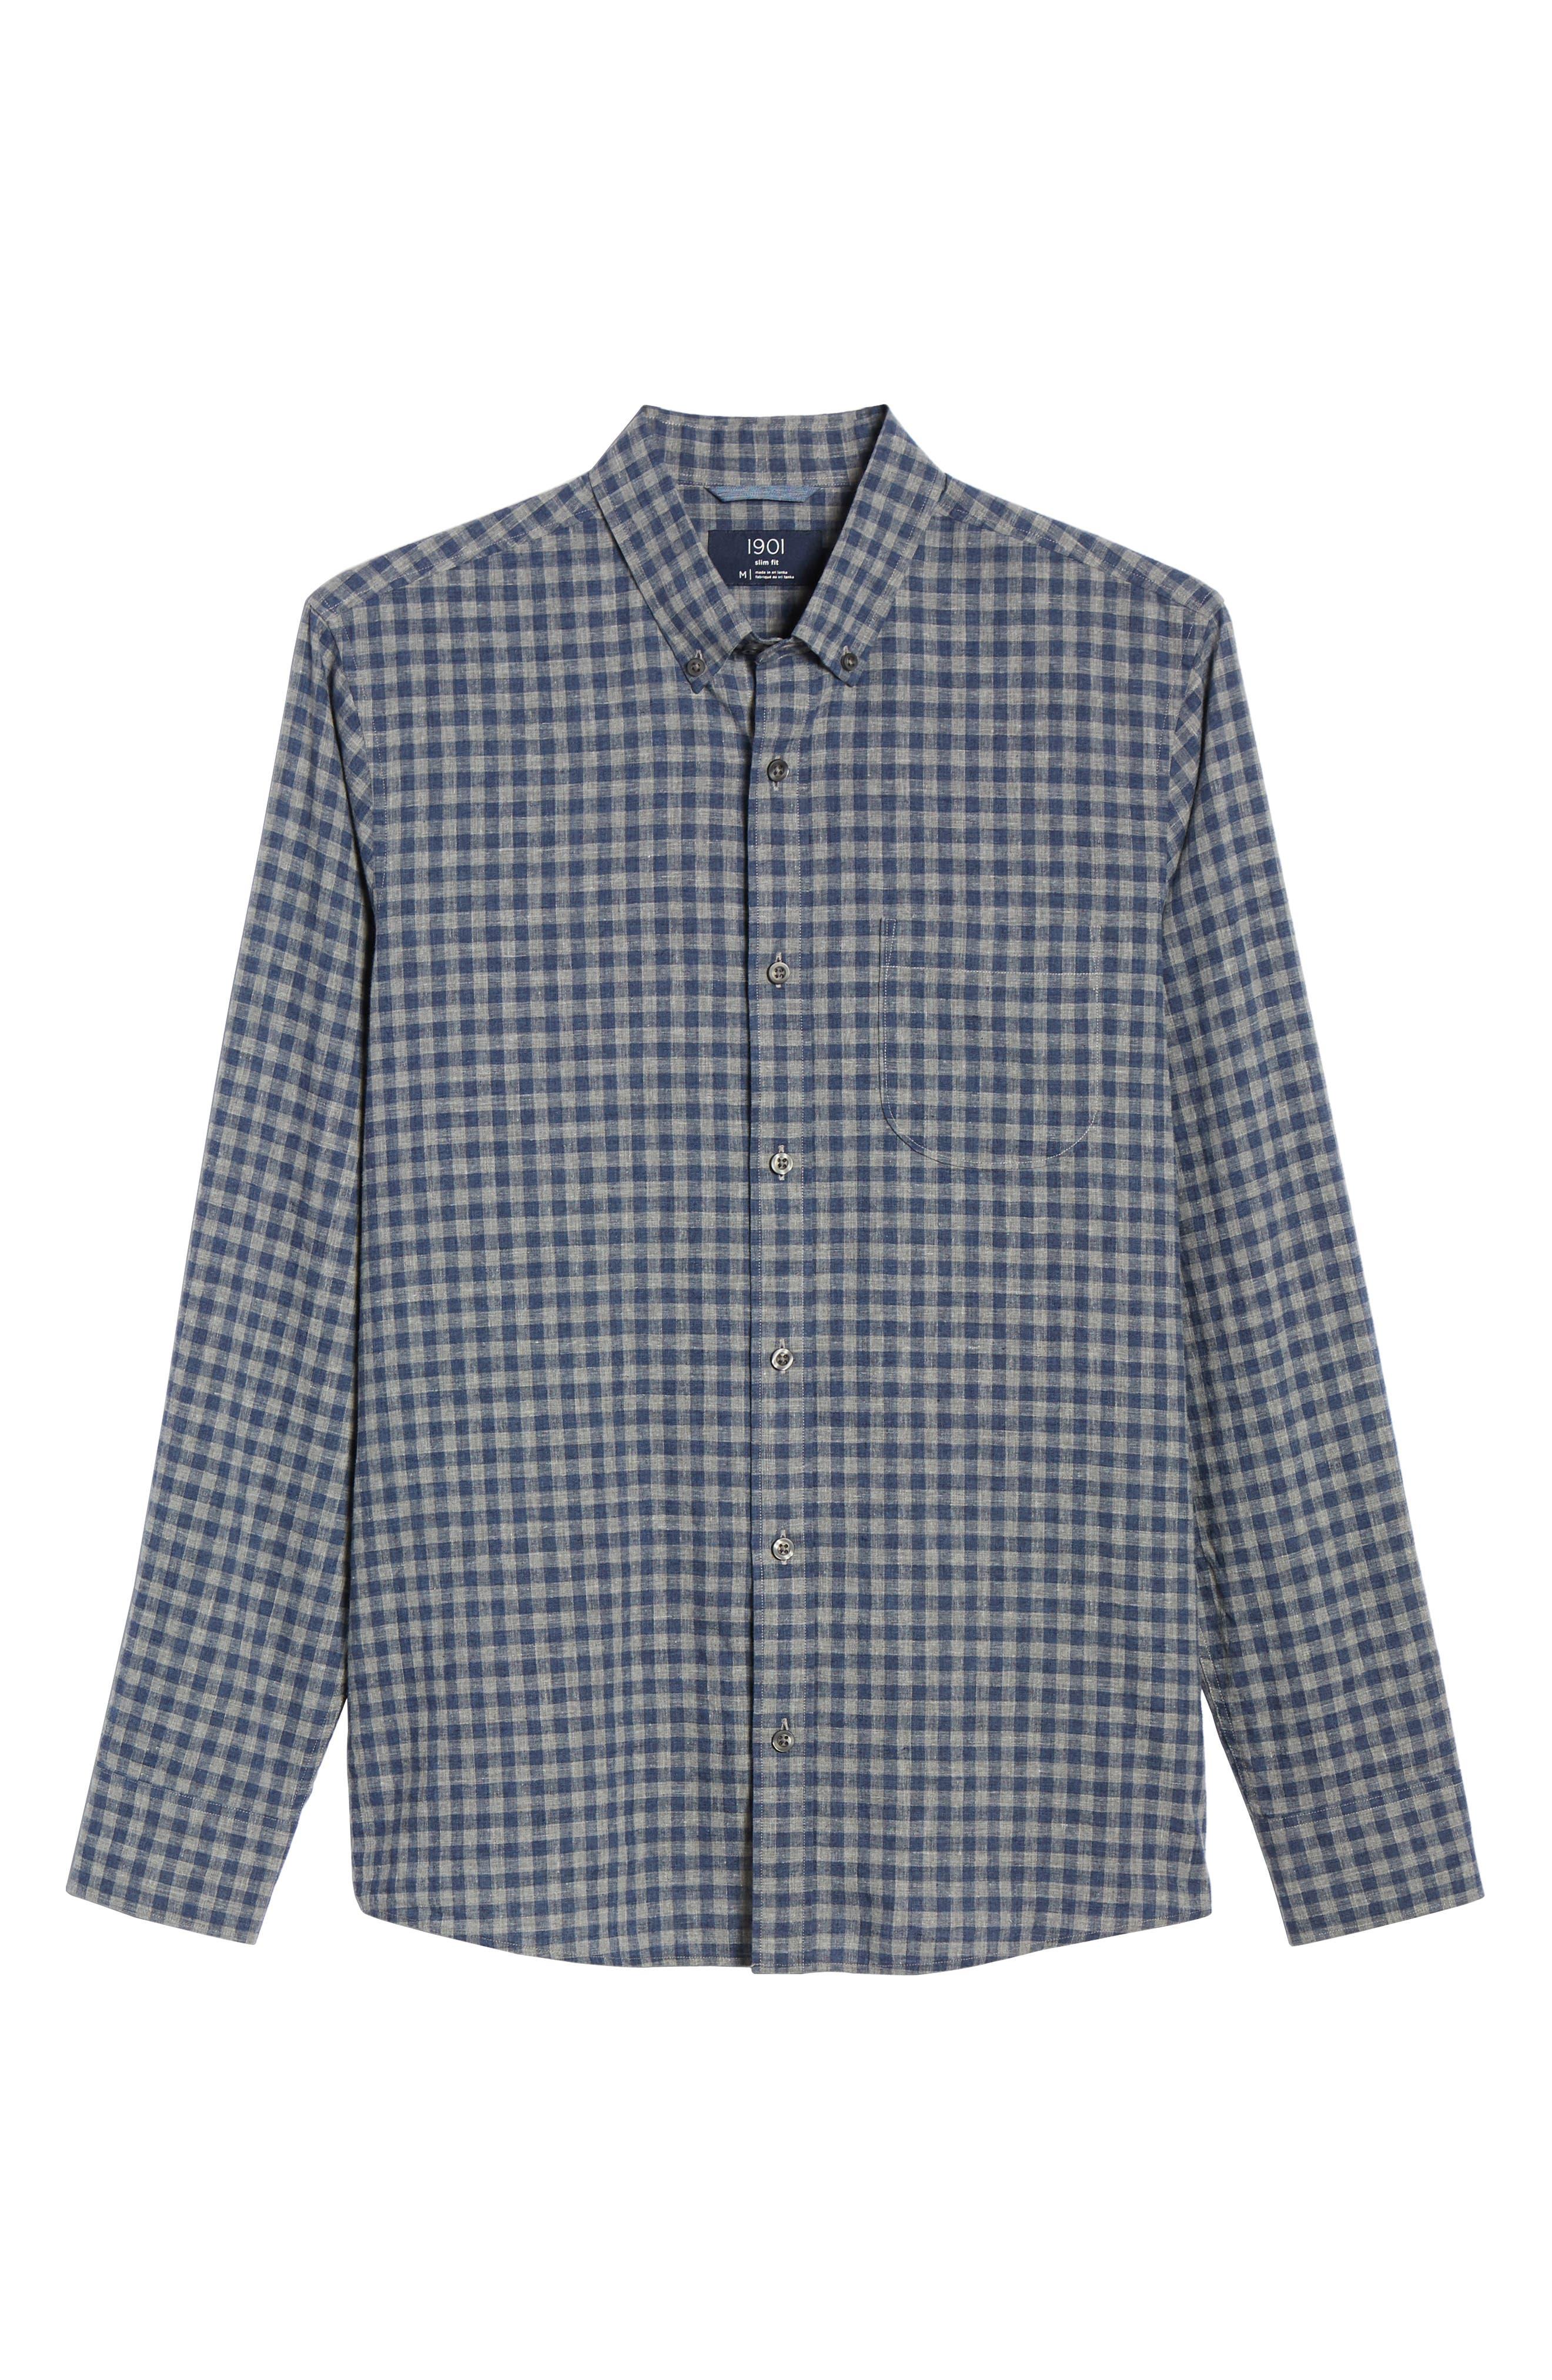 1901, Heather Gingham Linen Blend Slim Fit Sport Shirt, Alternate thumbnail 5, color, GREY OIL NAVY GINGHAM